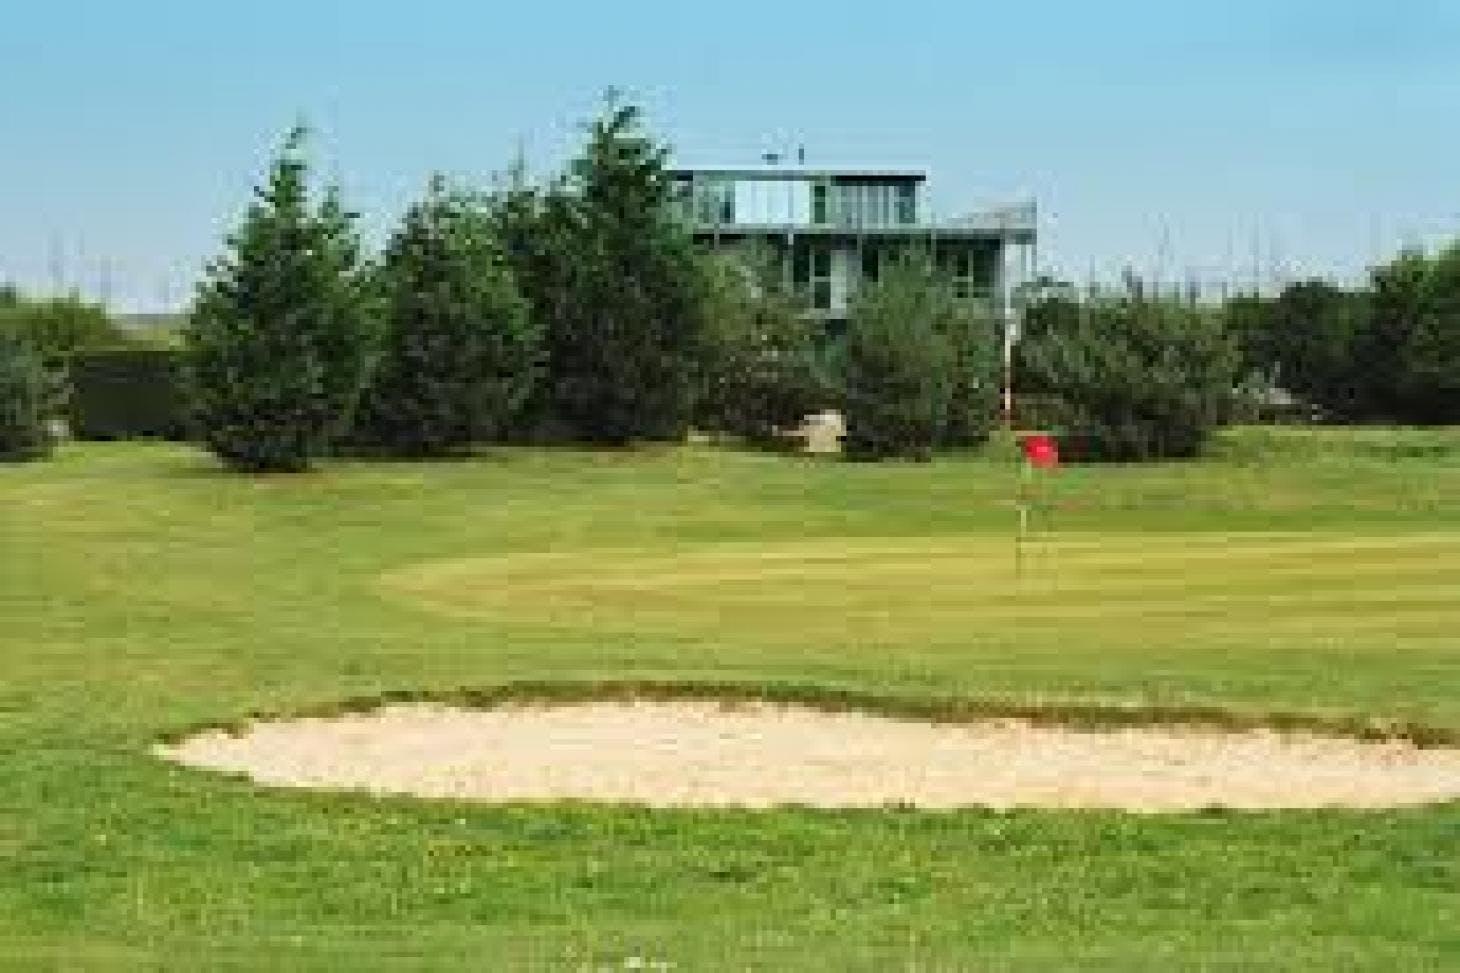 Thamesview Golf Centre 9 hole golf course